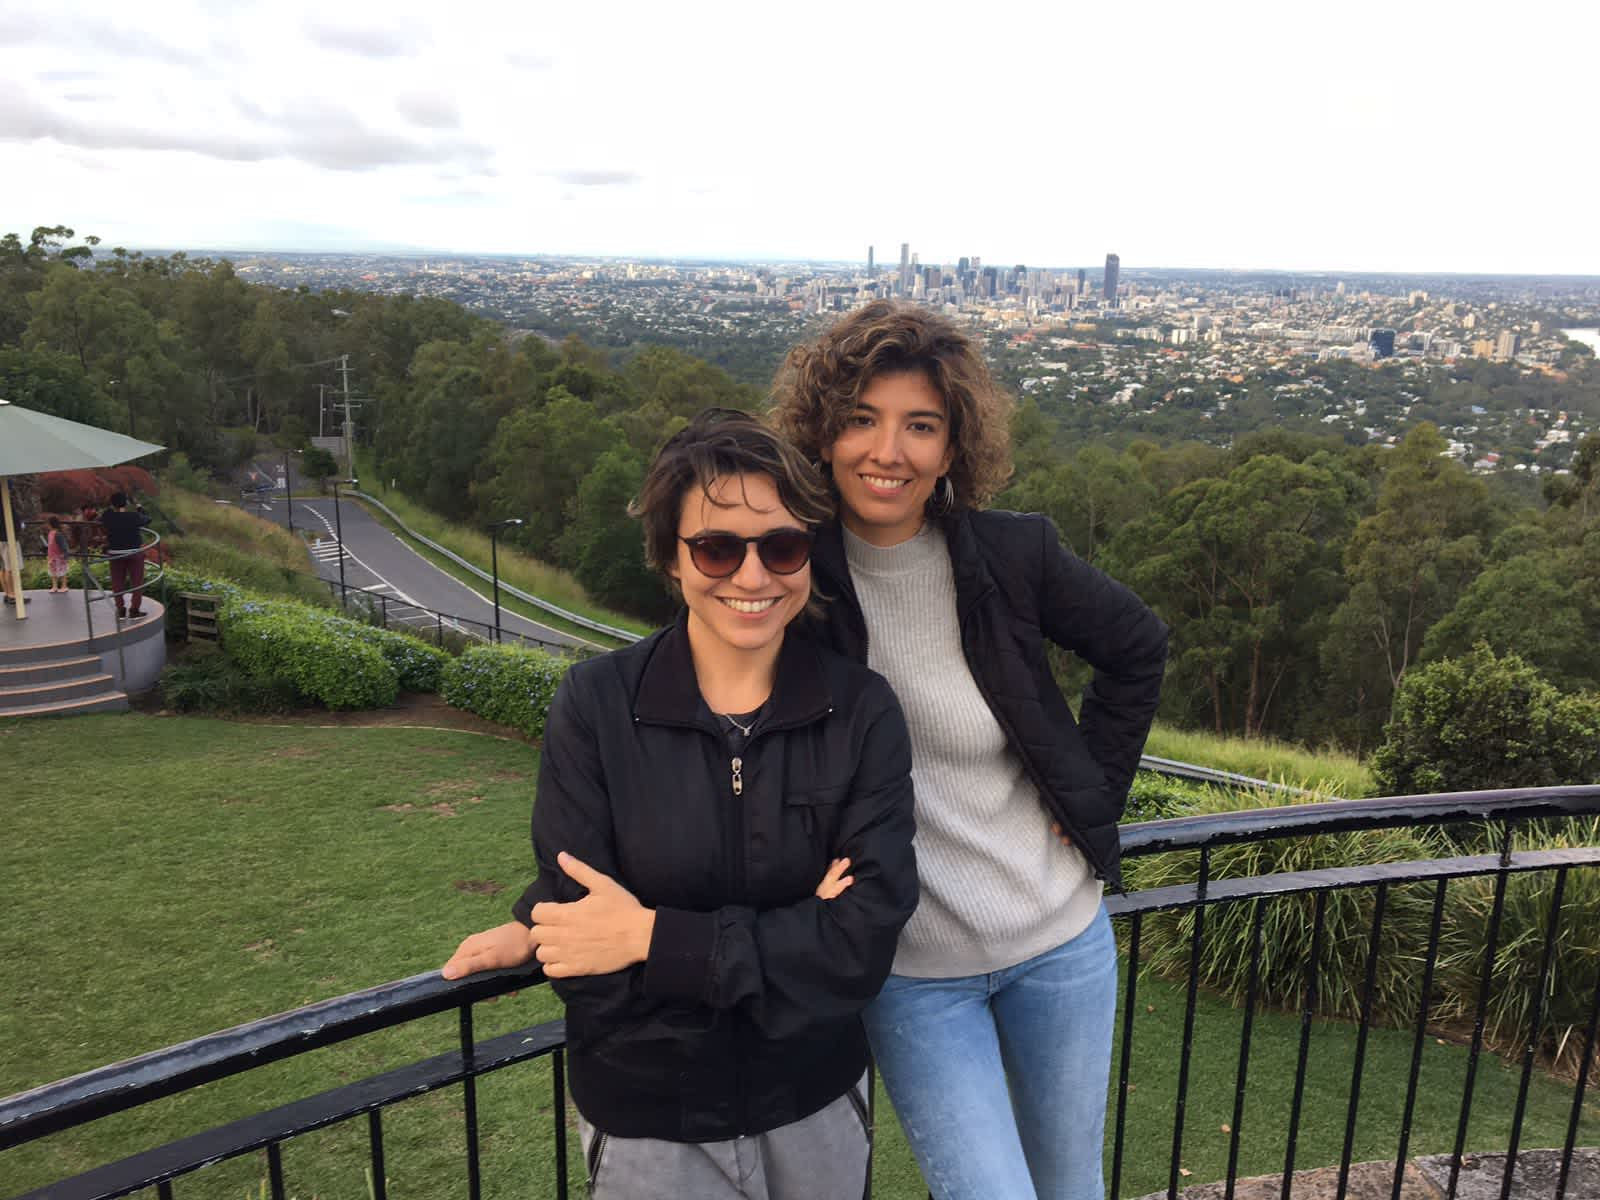 Livia & Gisleangela from Melbourne, Victoria, Australia